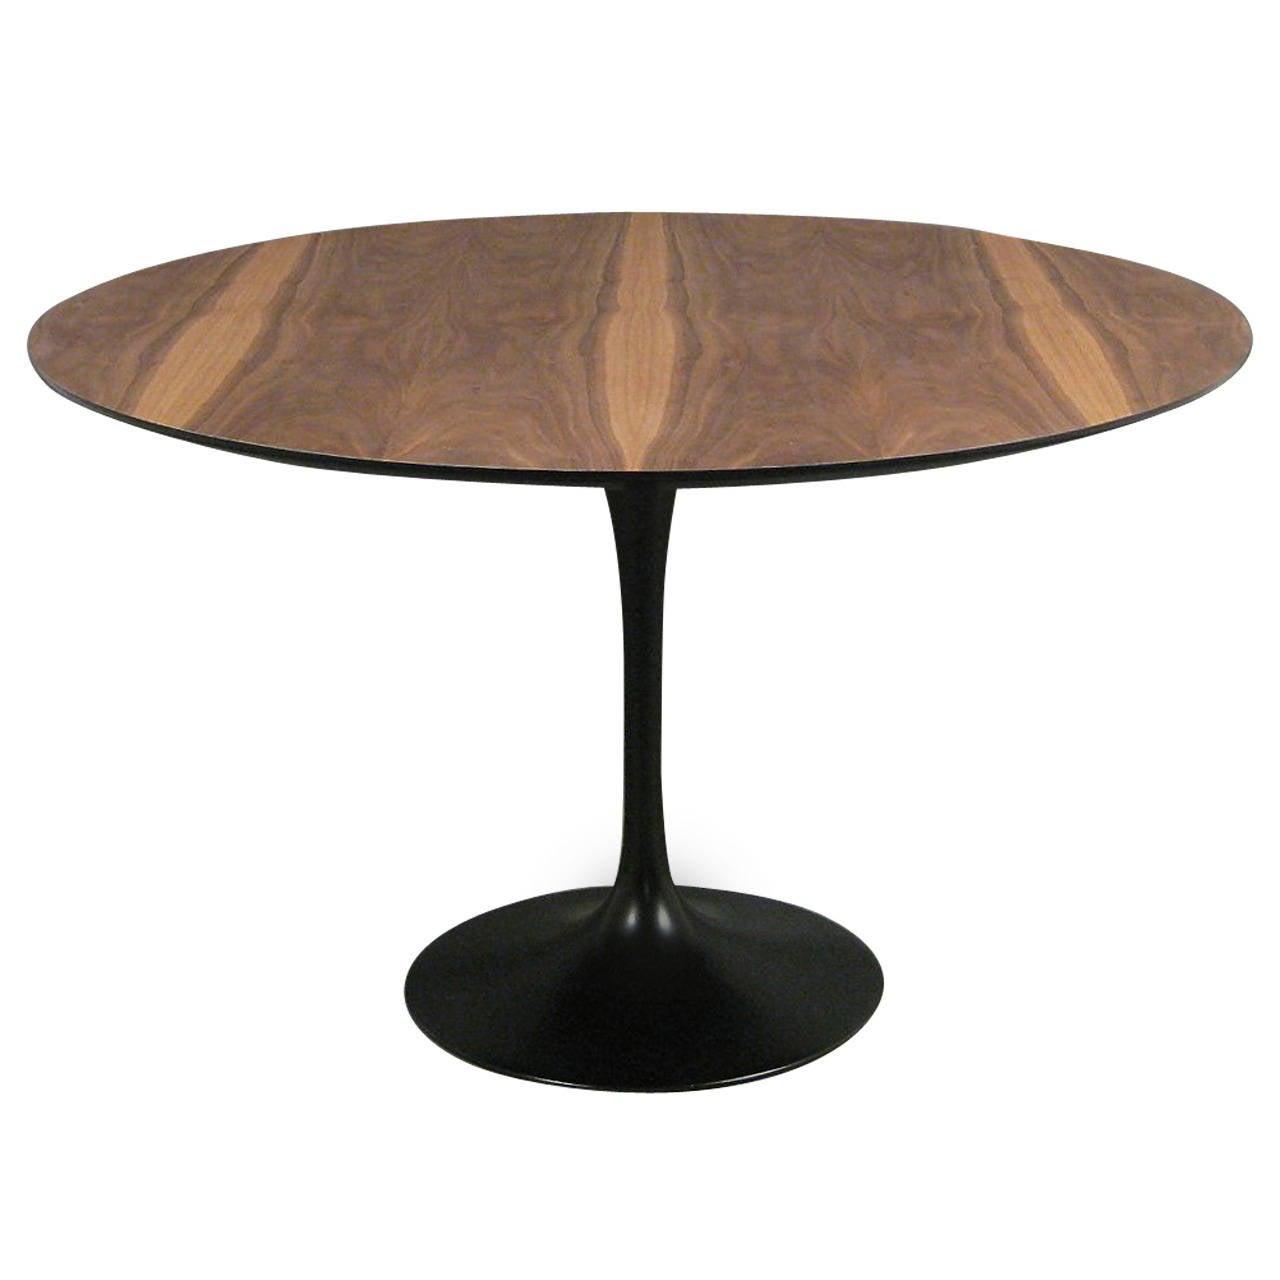 Eero Saarinen Tulip Dining Table By Knoll At 1stdibs